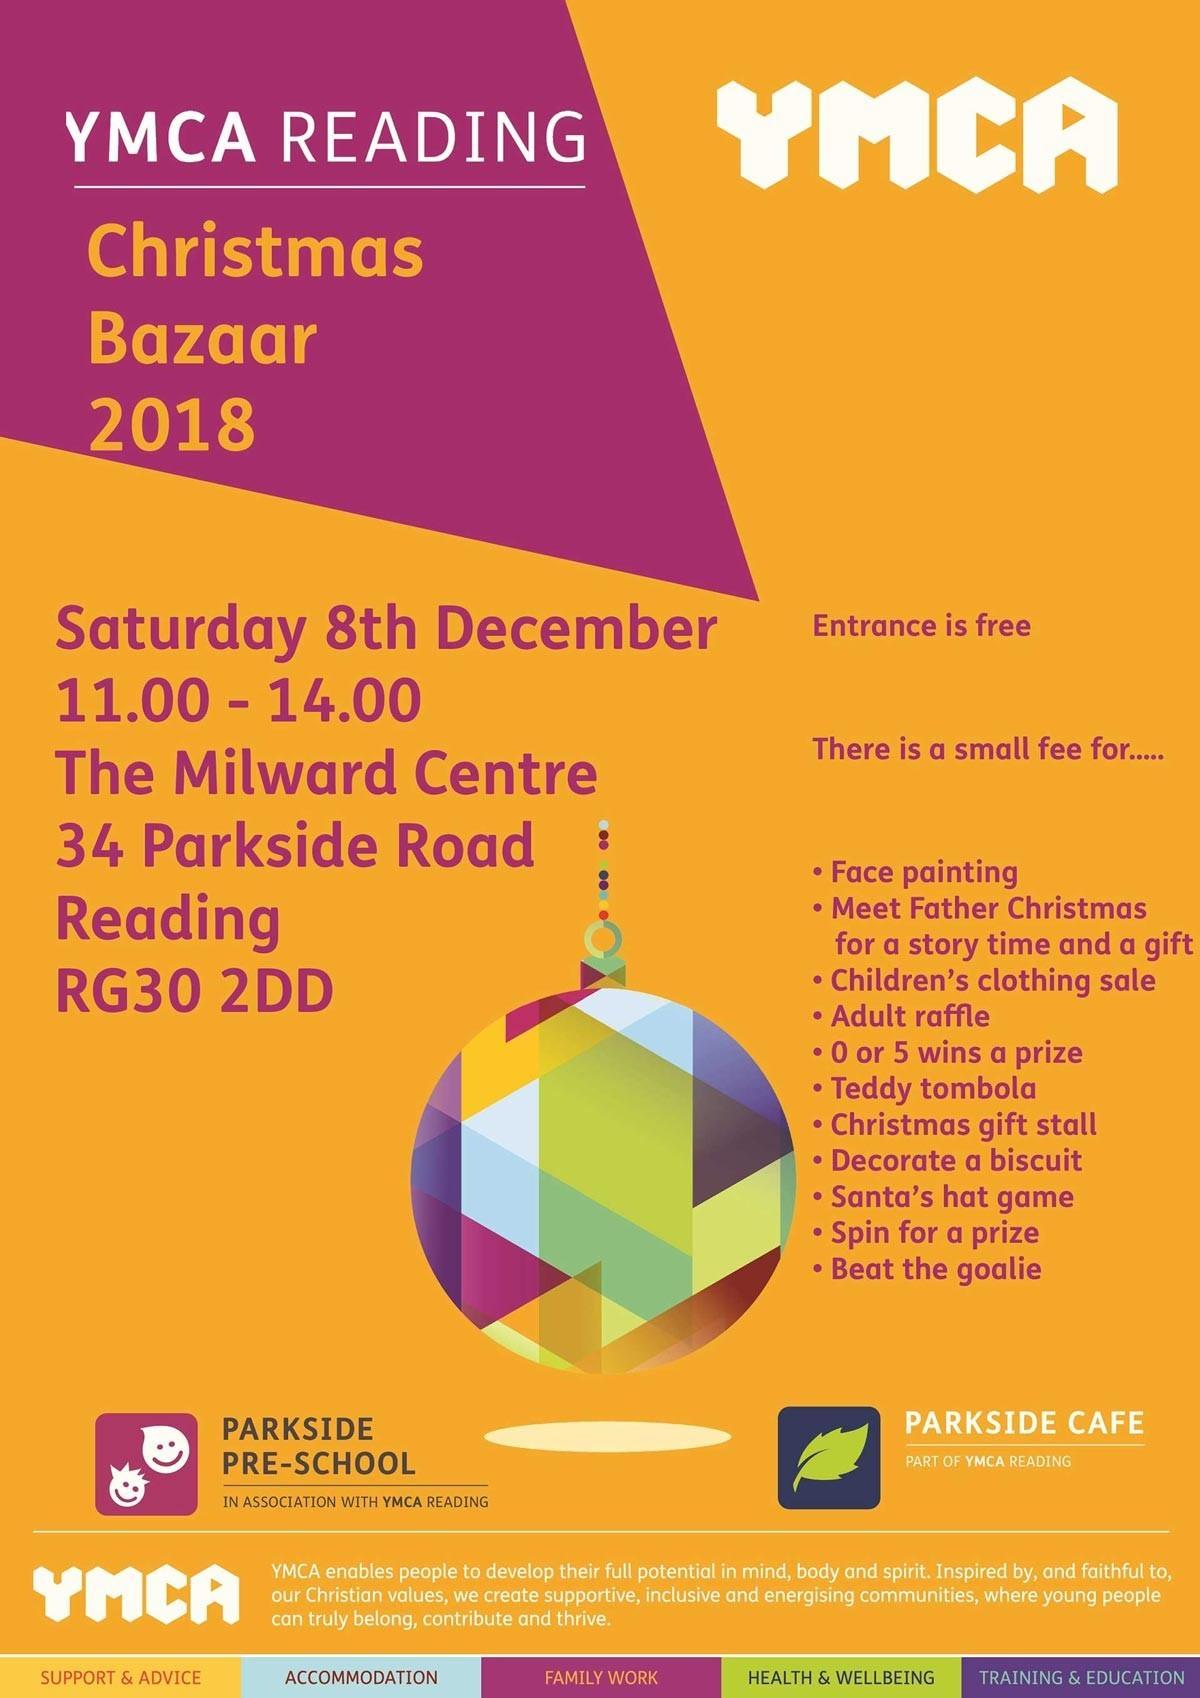 YMCA Reading Christmas Bazaar 2018